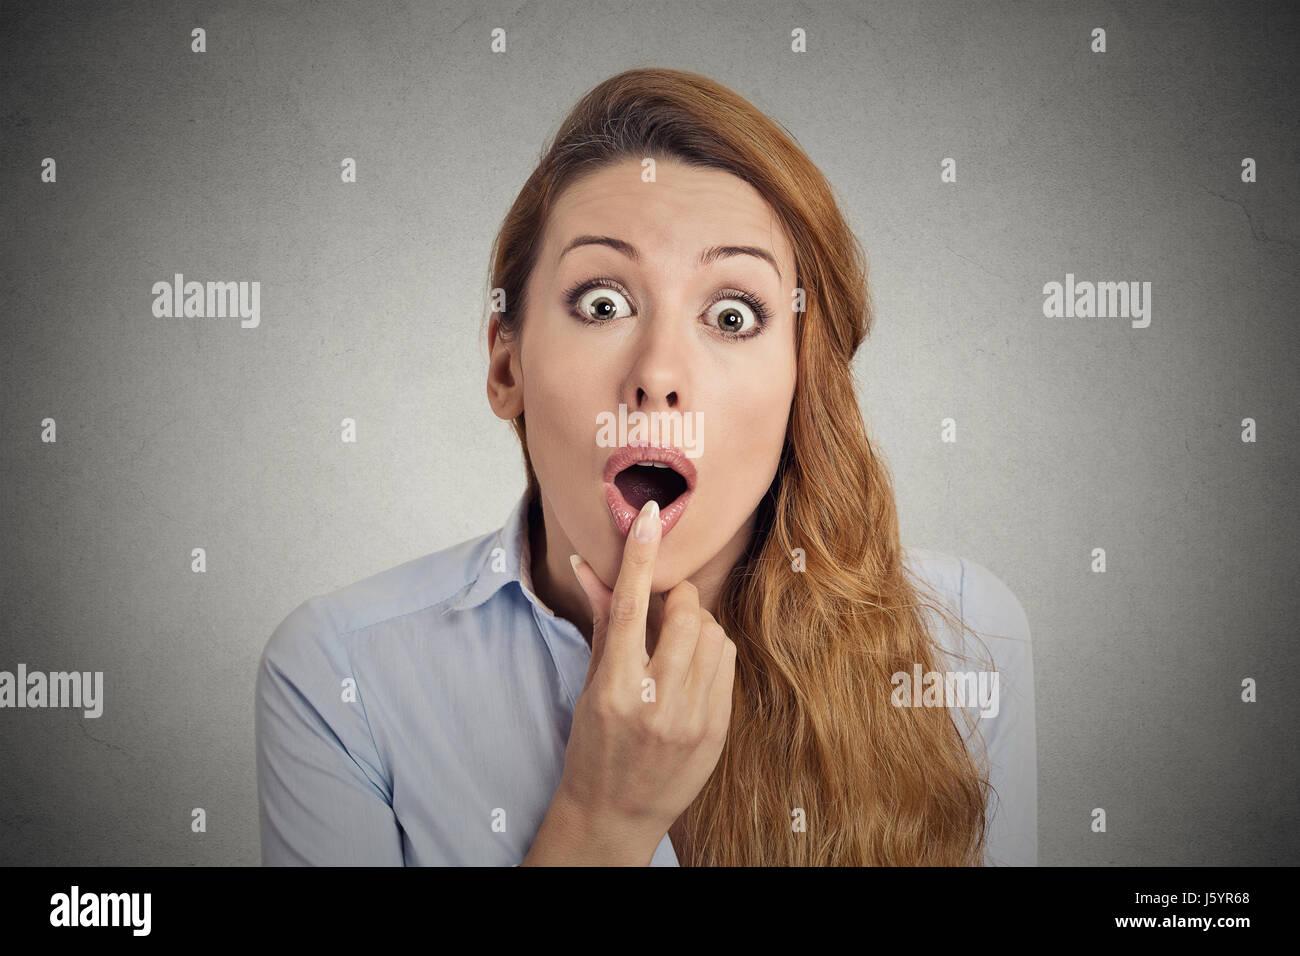 Чувака в рот, Ебут в рот русских девушек на 13 фотография